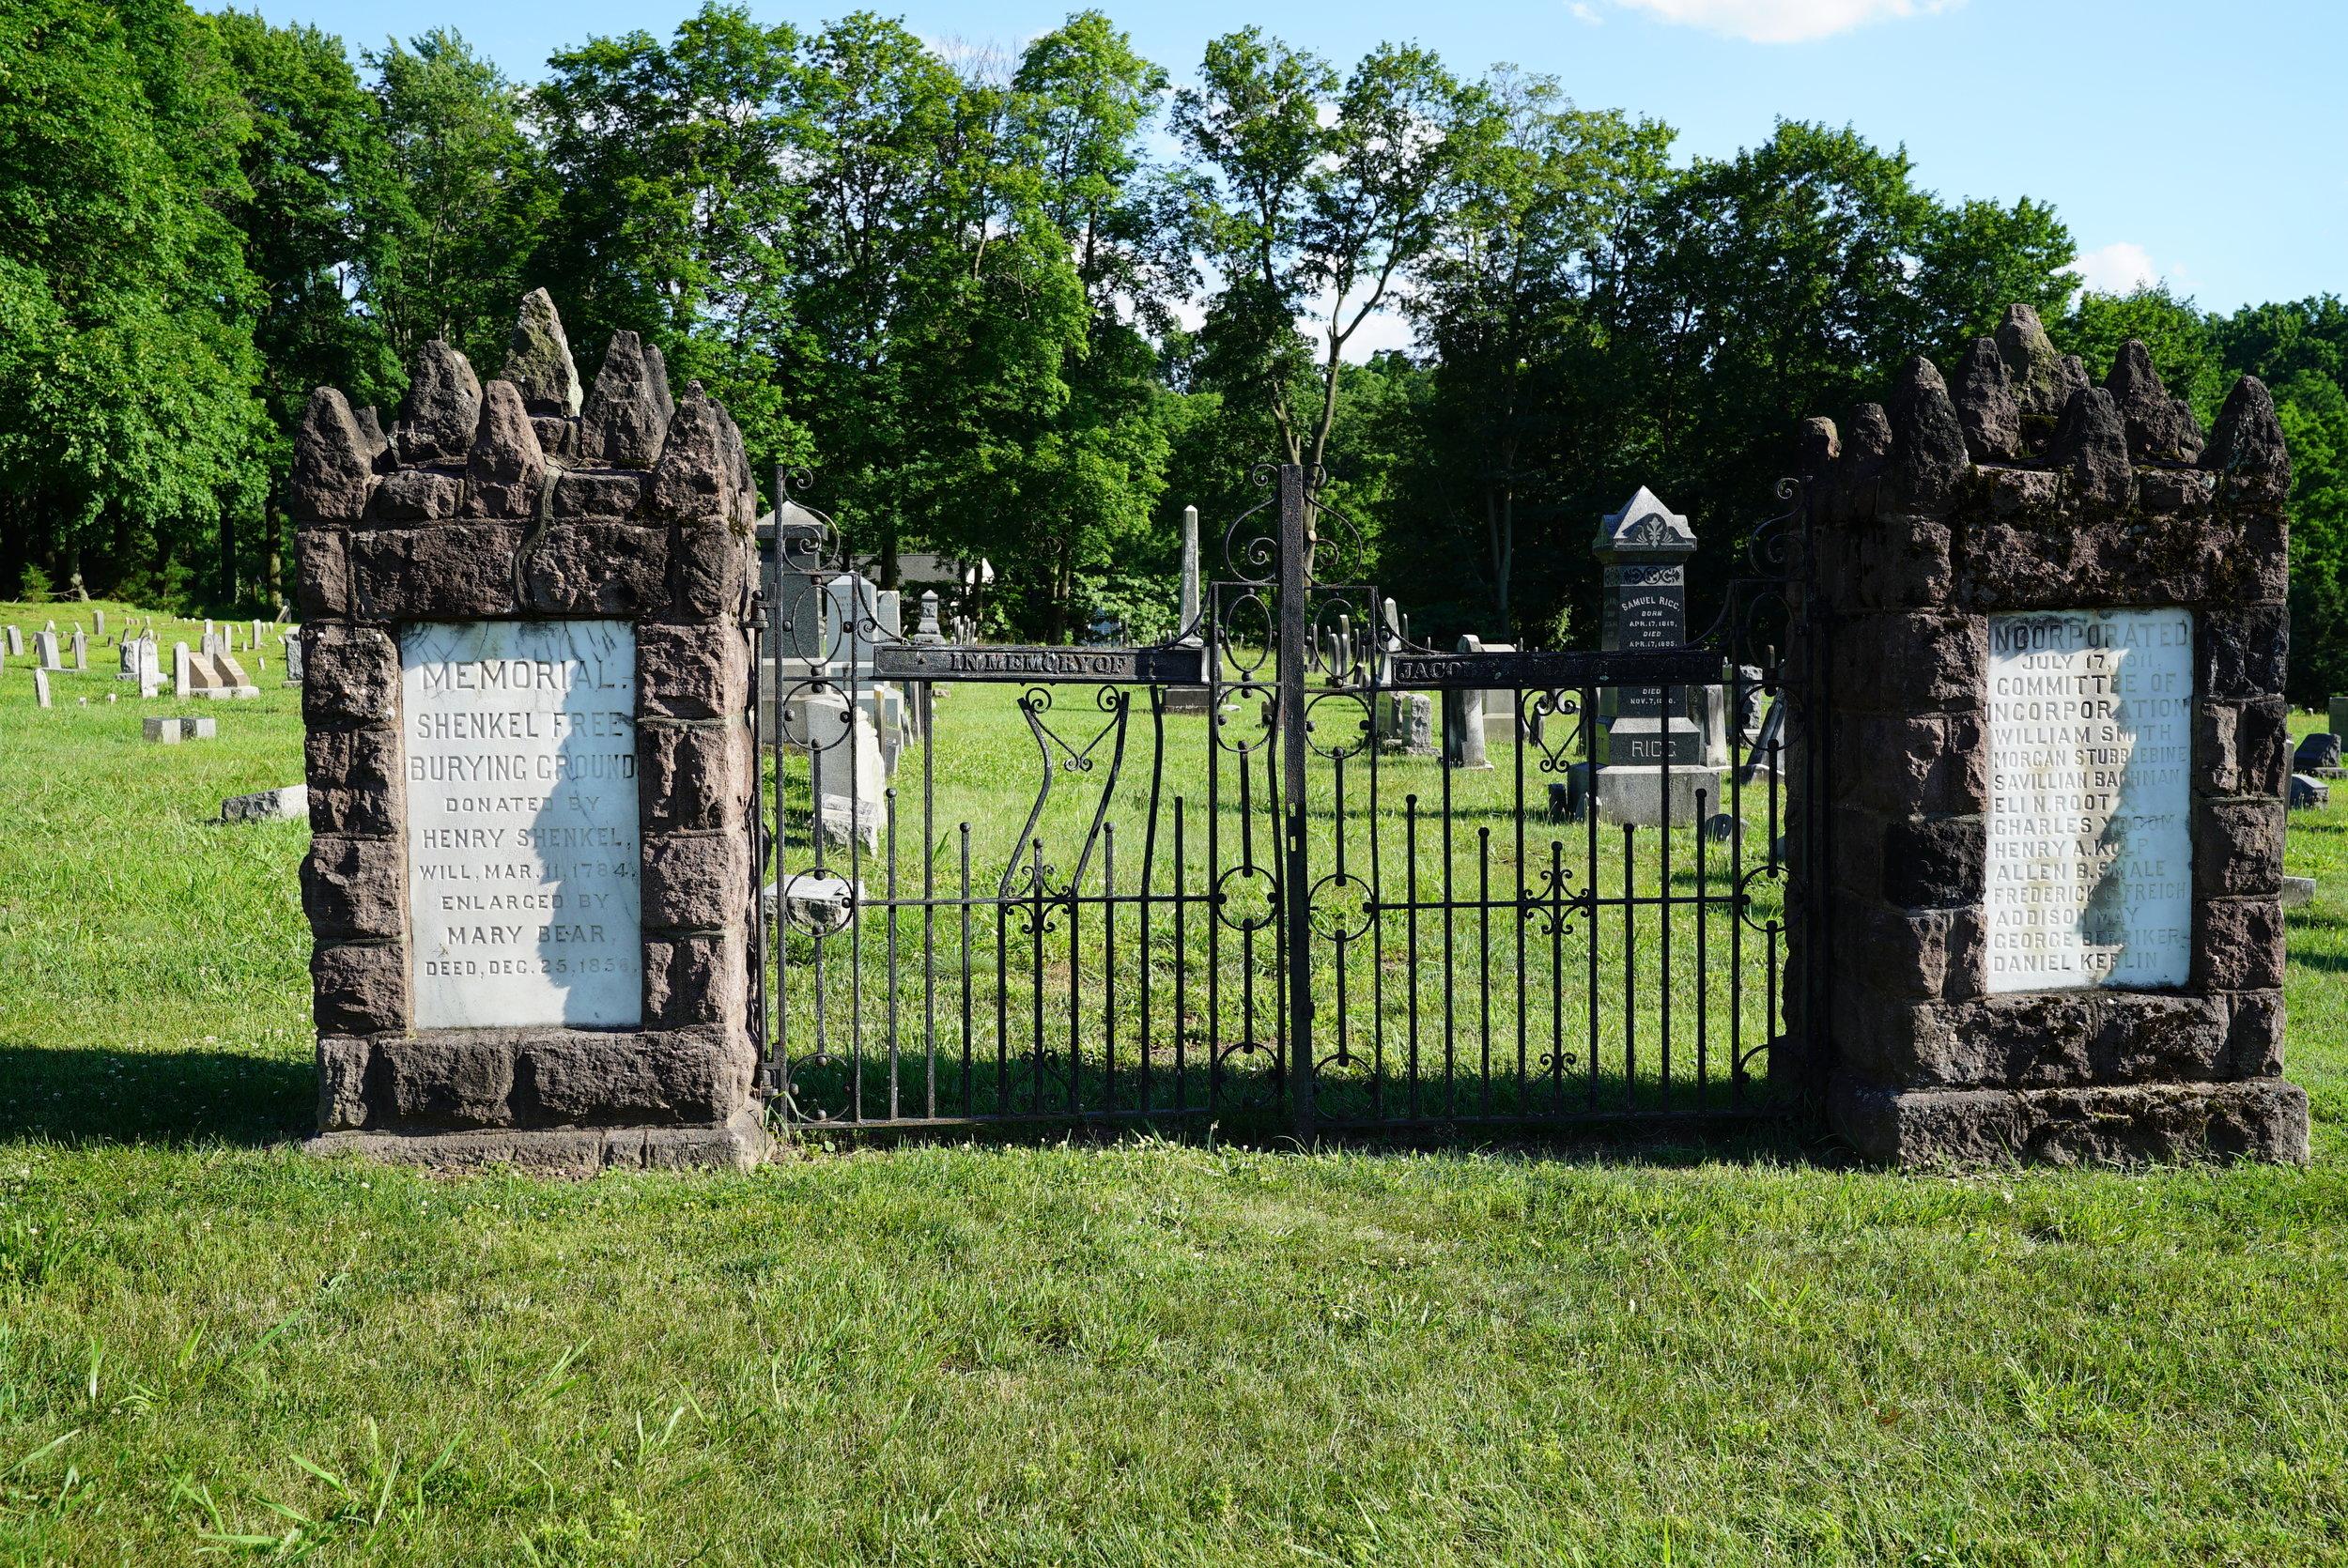 Shenkel United Church Of Christ Cemetery. Pottstown, Pennsylania.